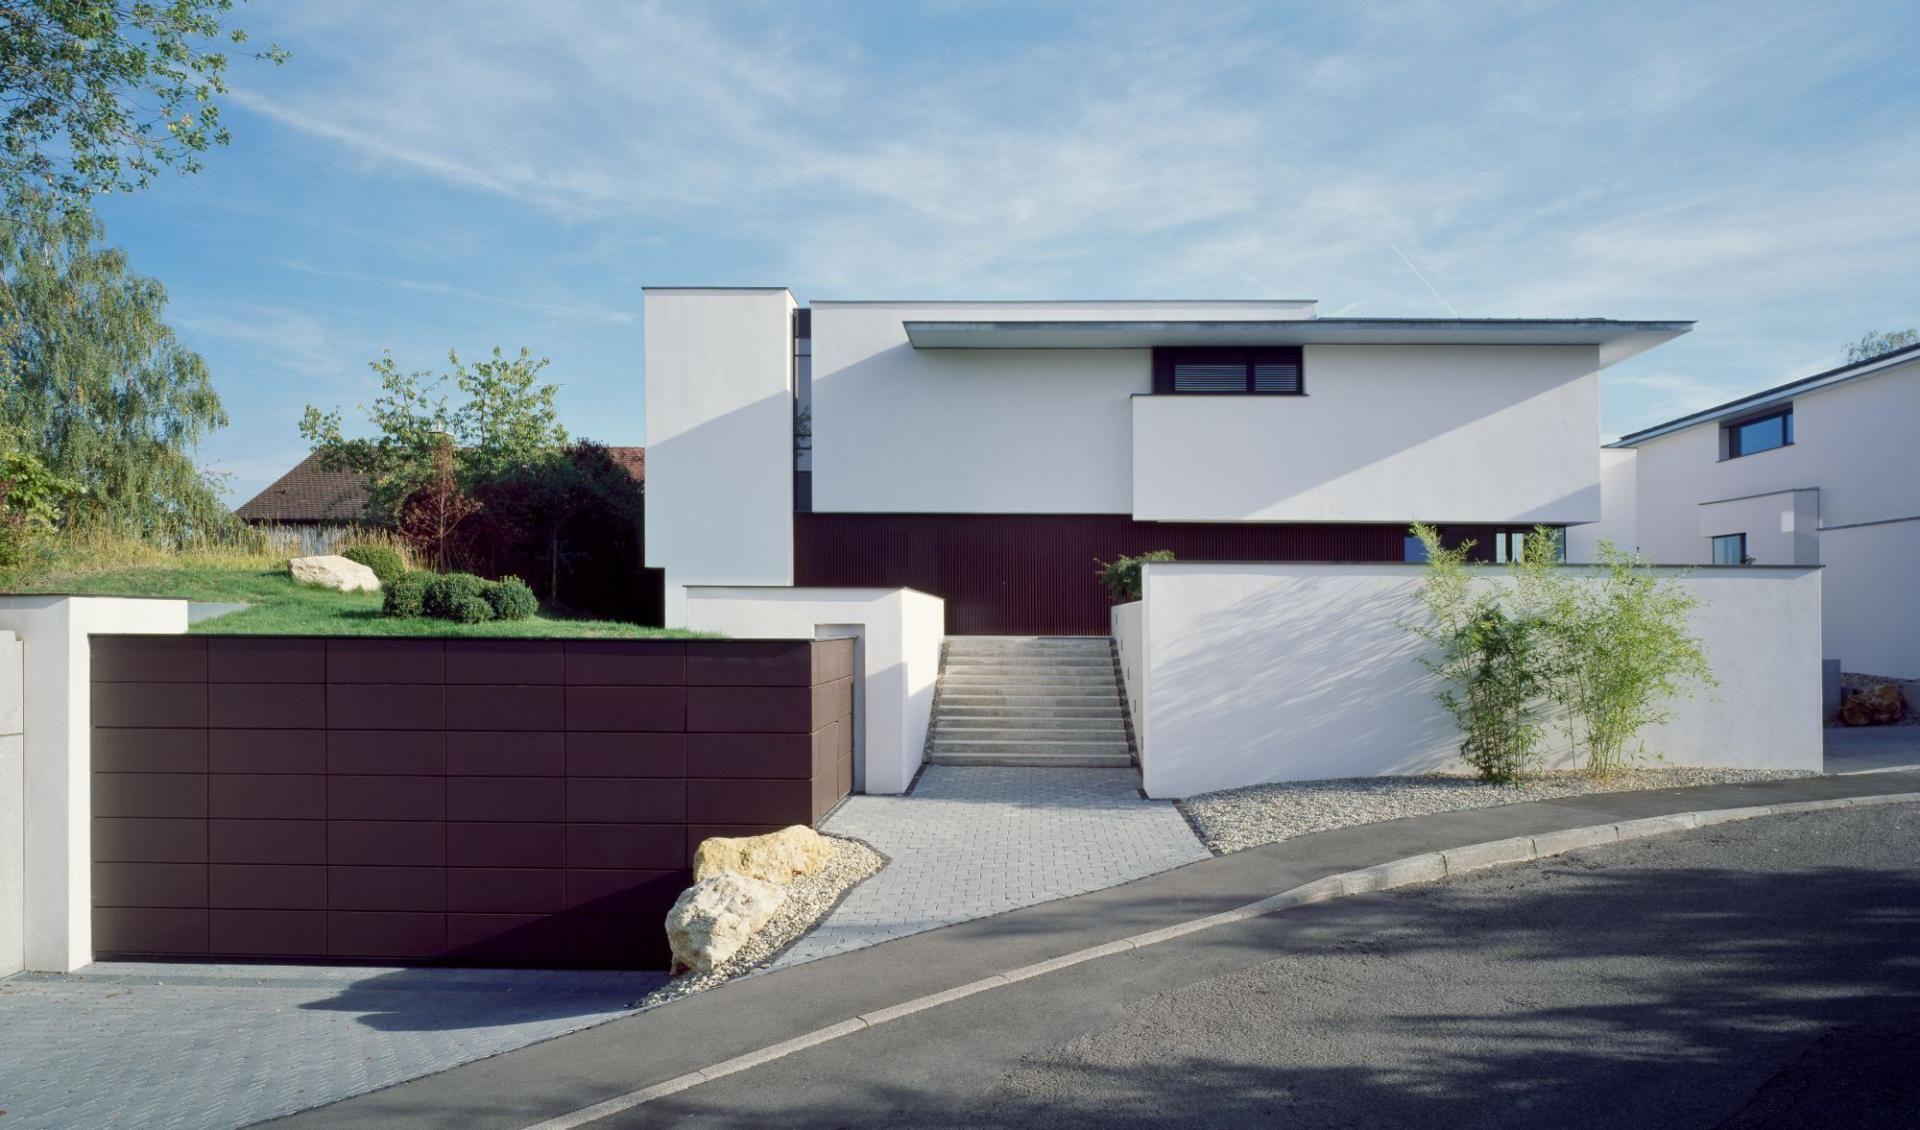 kuhnle knoedler residential pinterest wohnungsbau haus und moderne h user. Black Bedroom Furniture Sets. Home Design Ideas